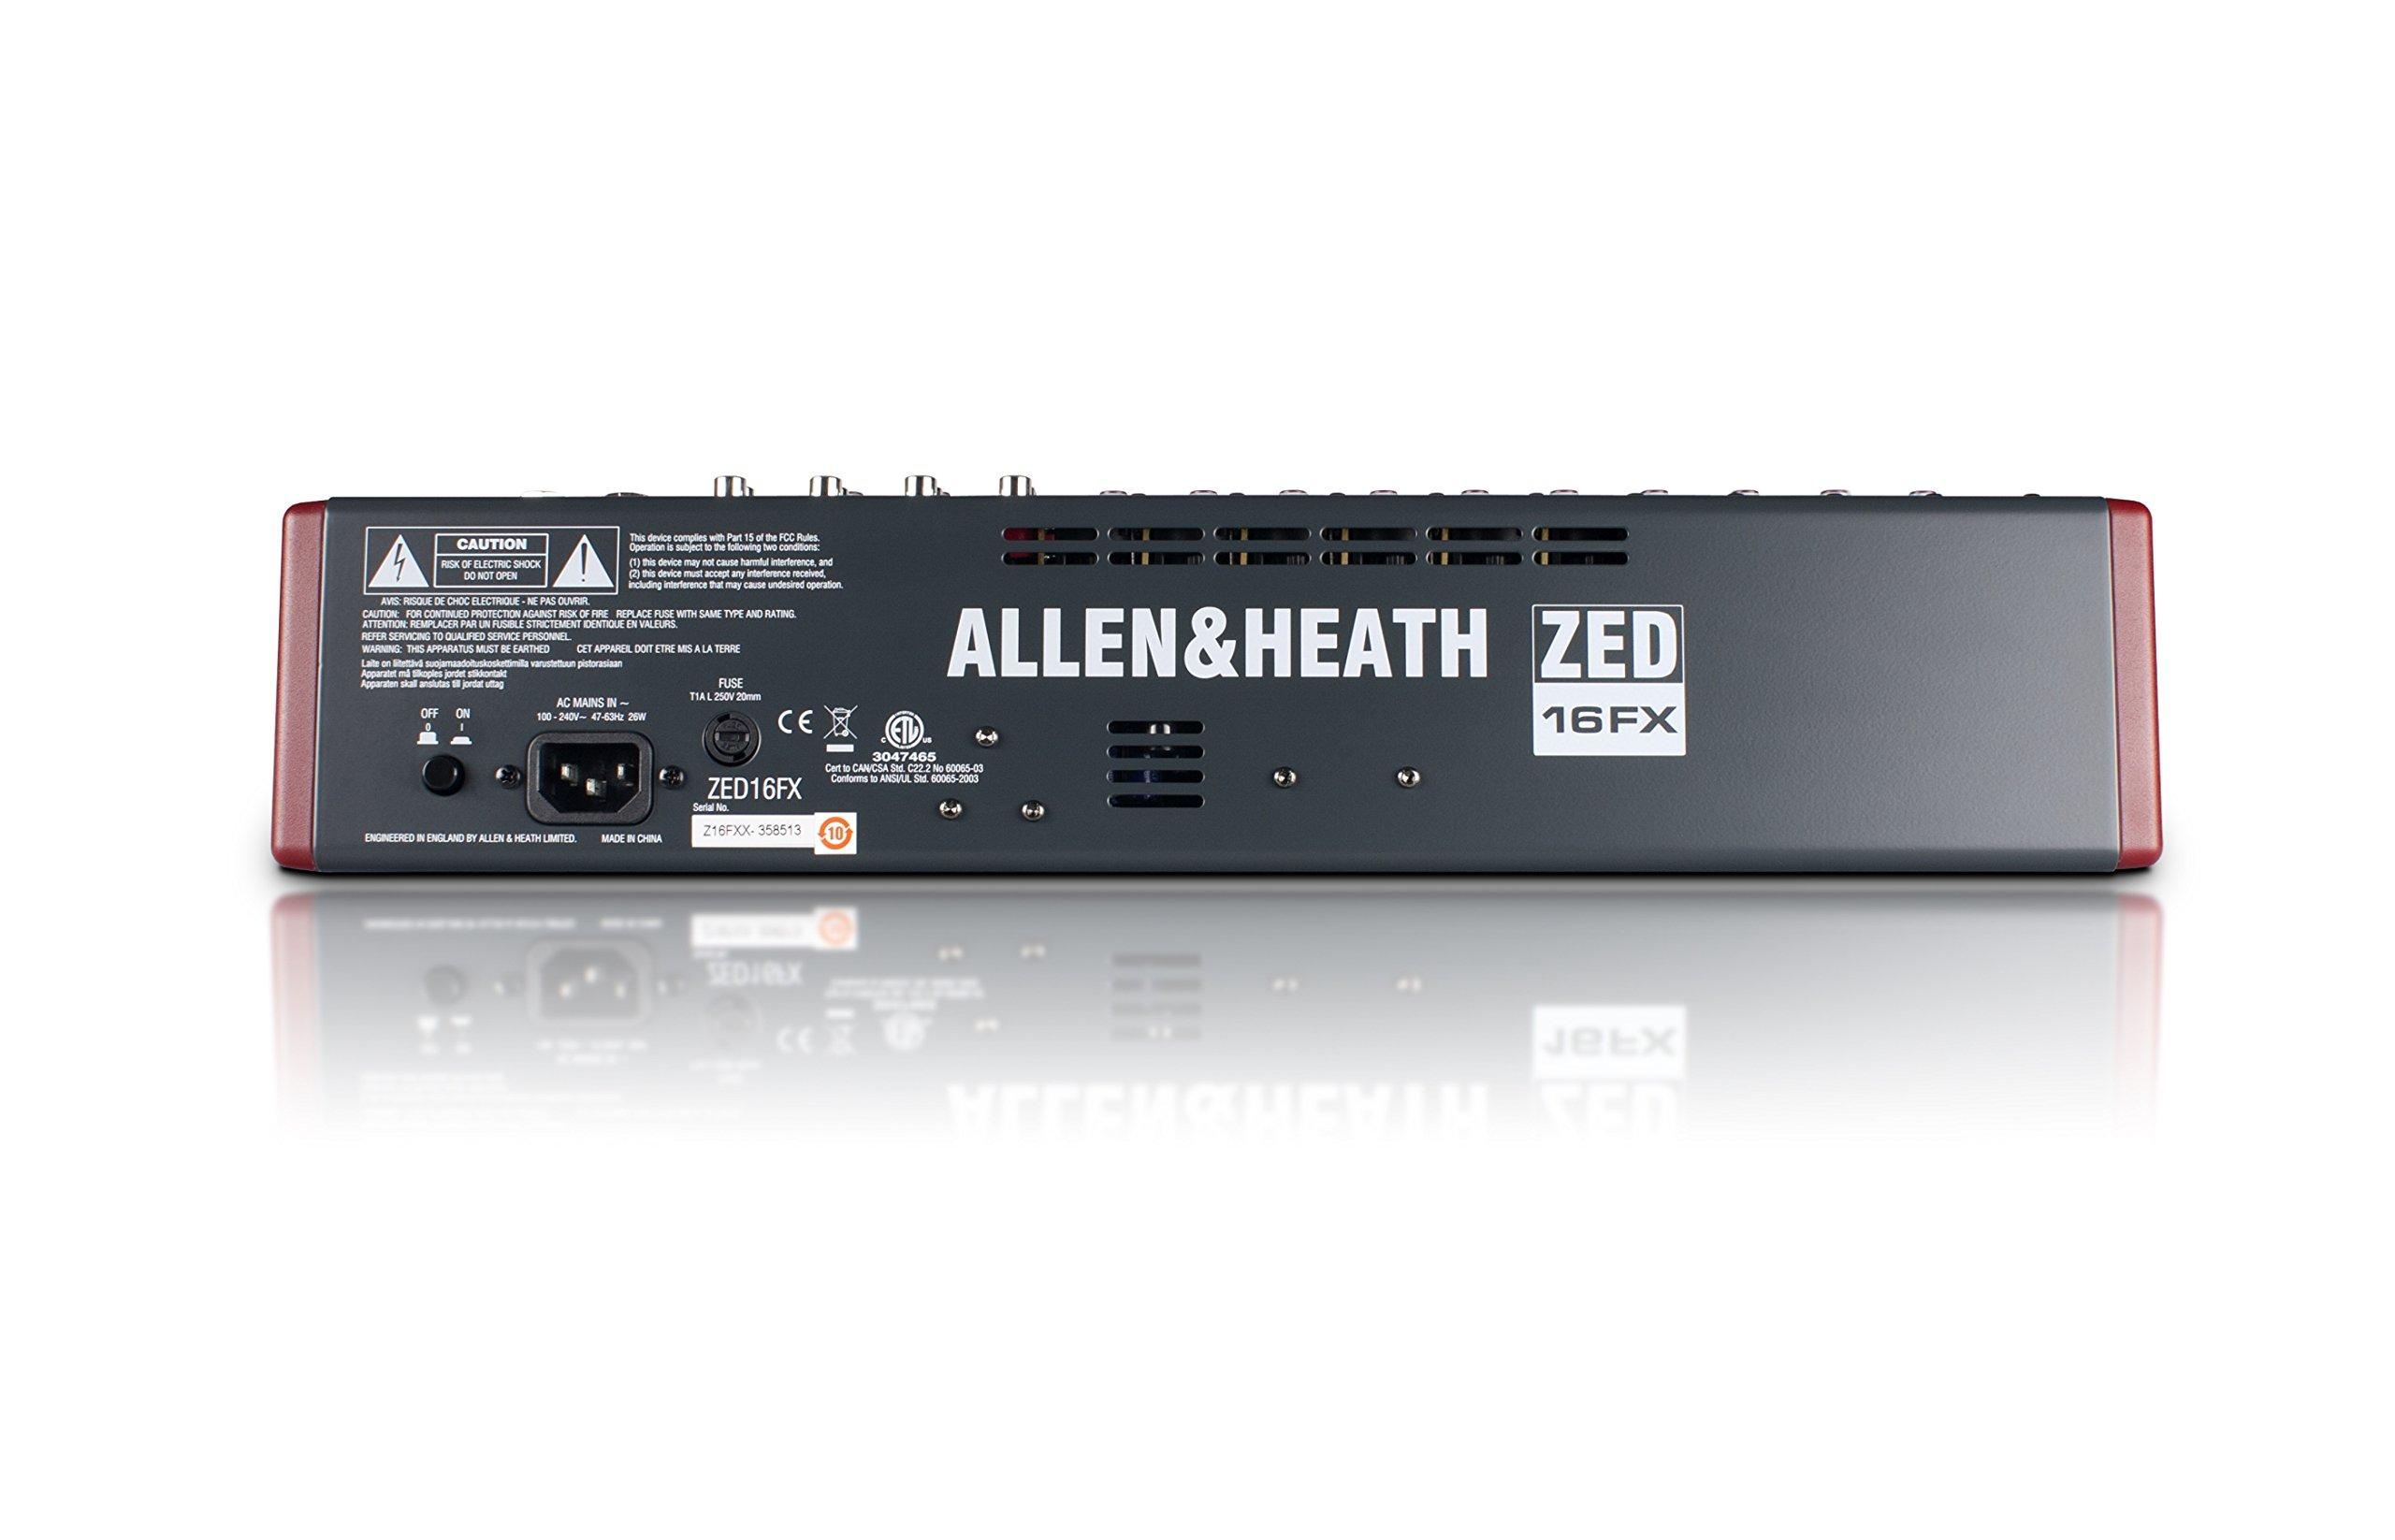 Allen & Heath ZED-16FX 16-Channel Multi-Purpose USB Mixer with FX for Live Sound and Recording by Allen & Heath (Image #6)